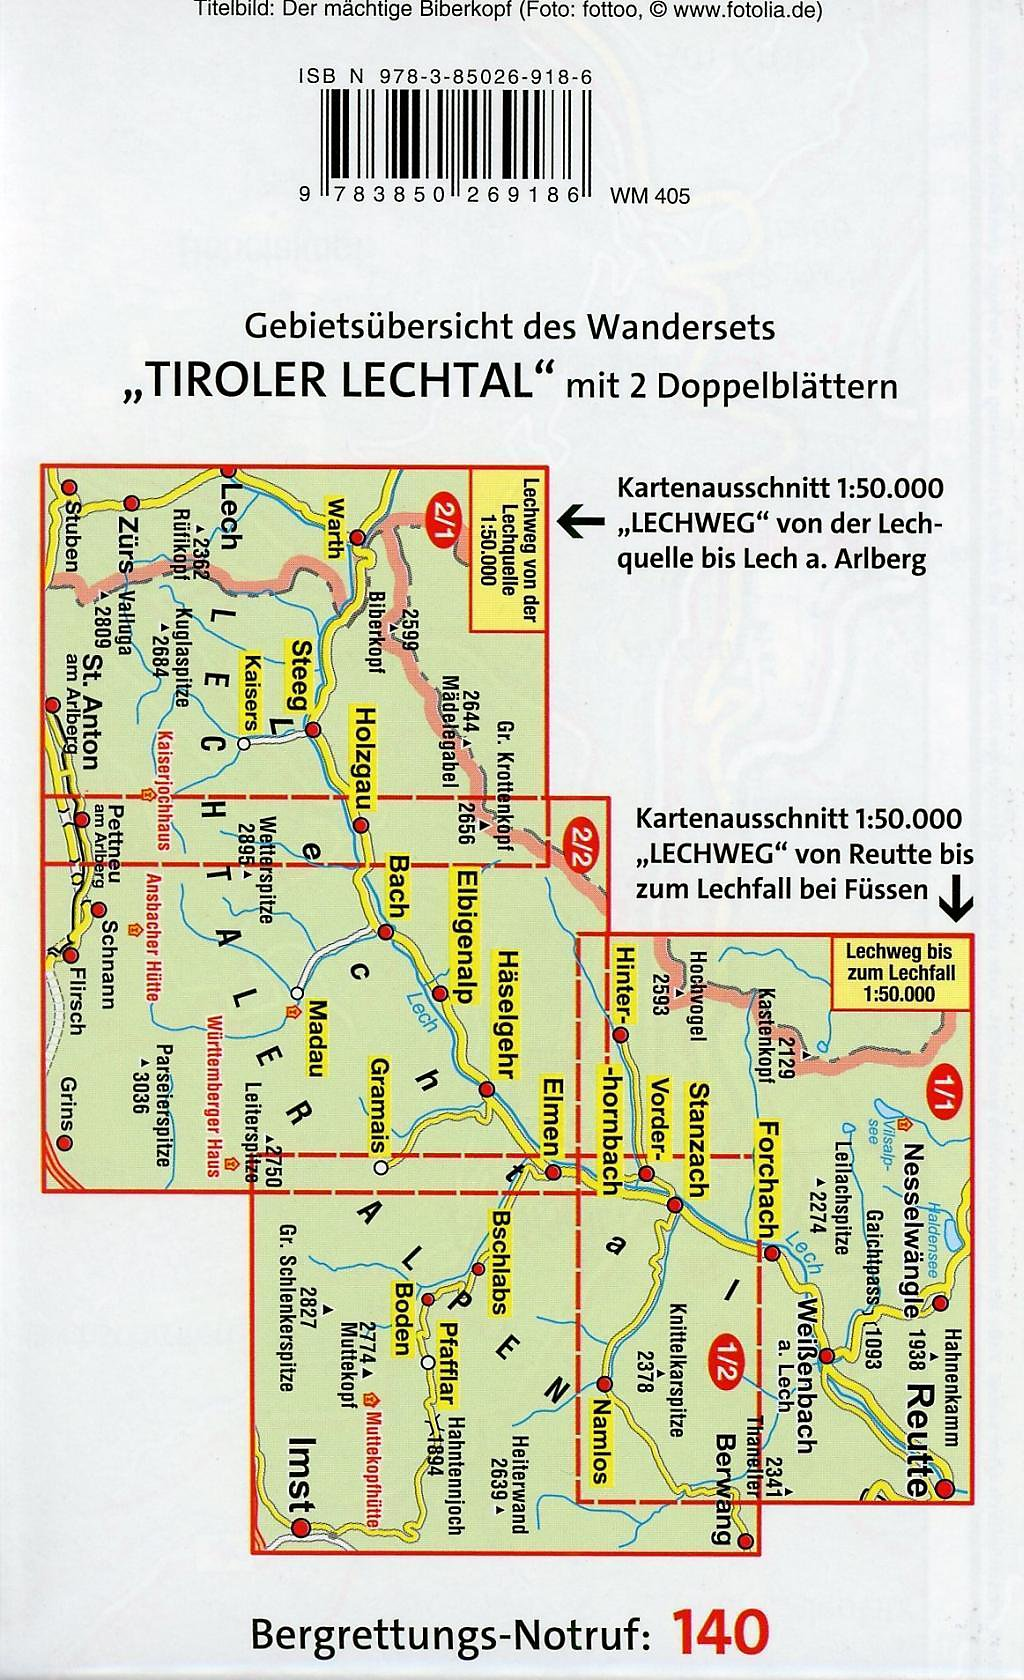 Lechweg Karte.Mayr Karte Ferienregion Tiroler Lechtal 2 Blätter Buch Portofrei